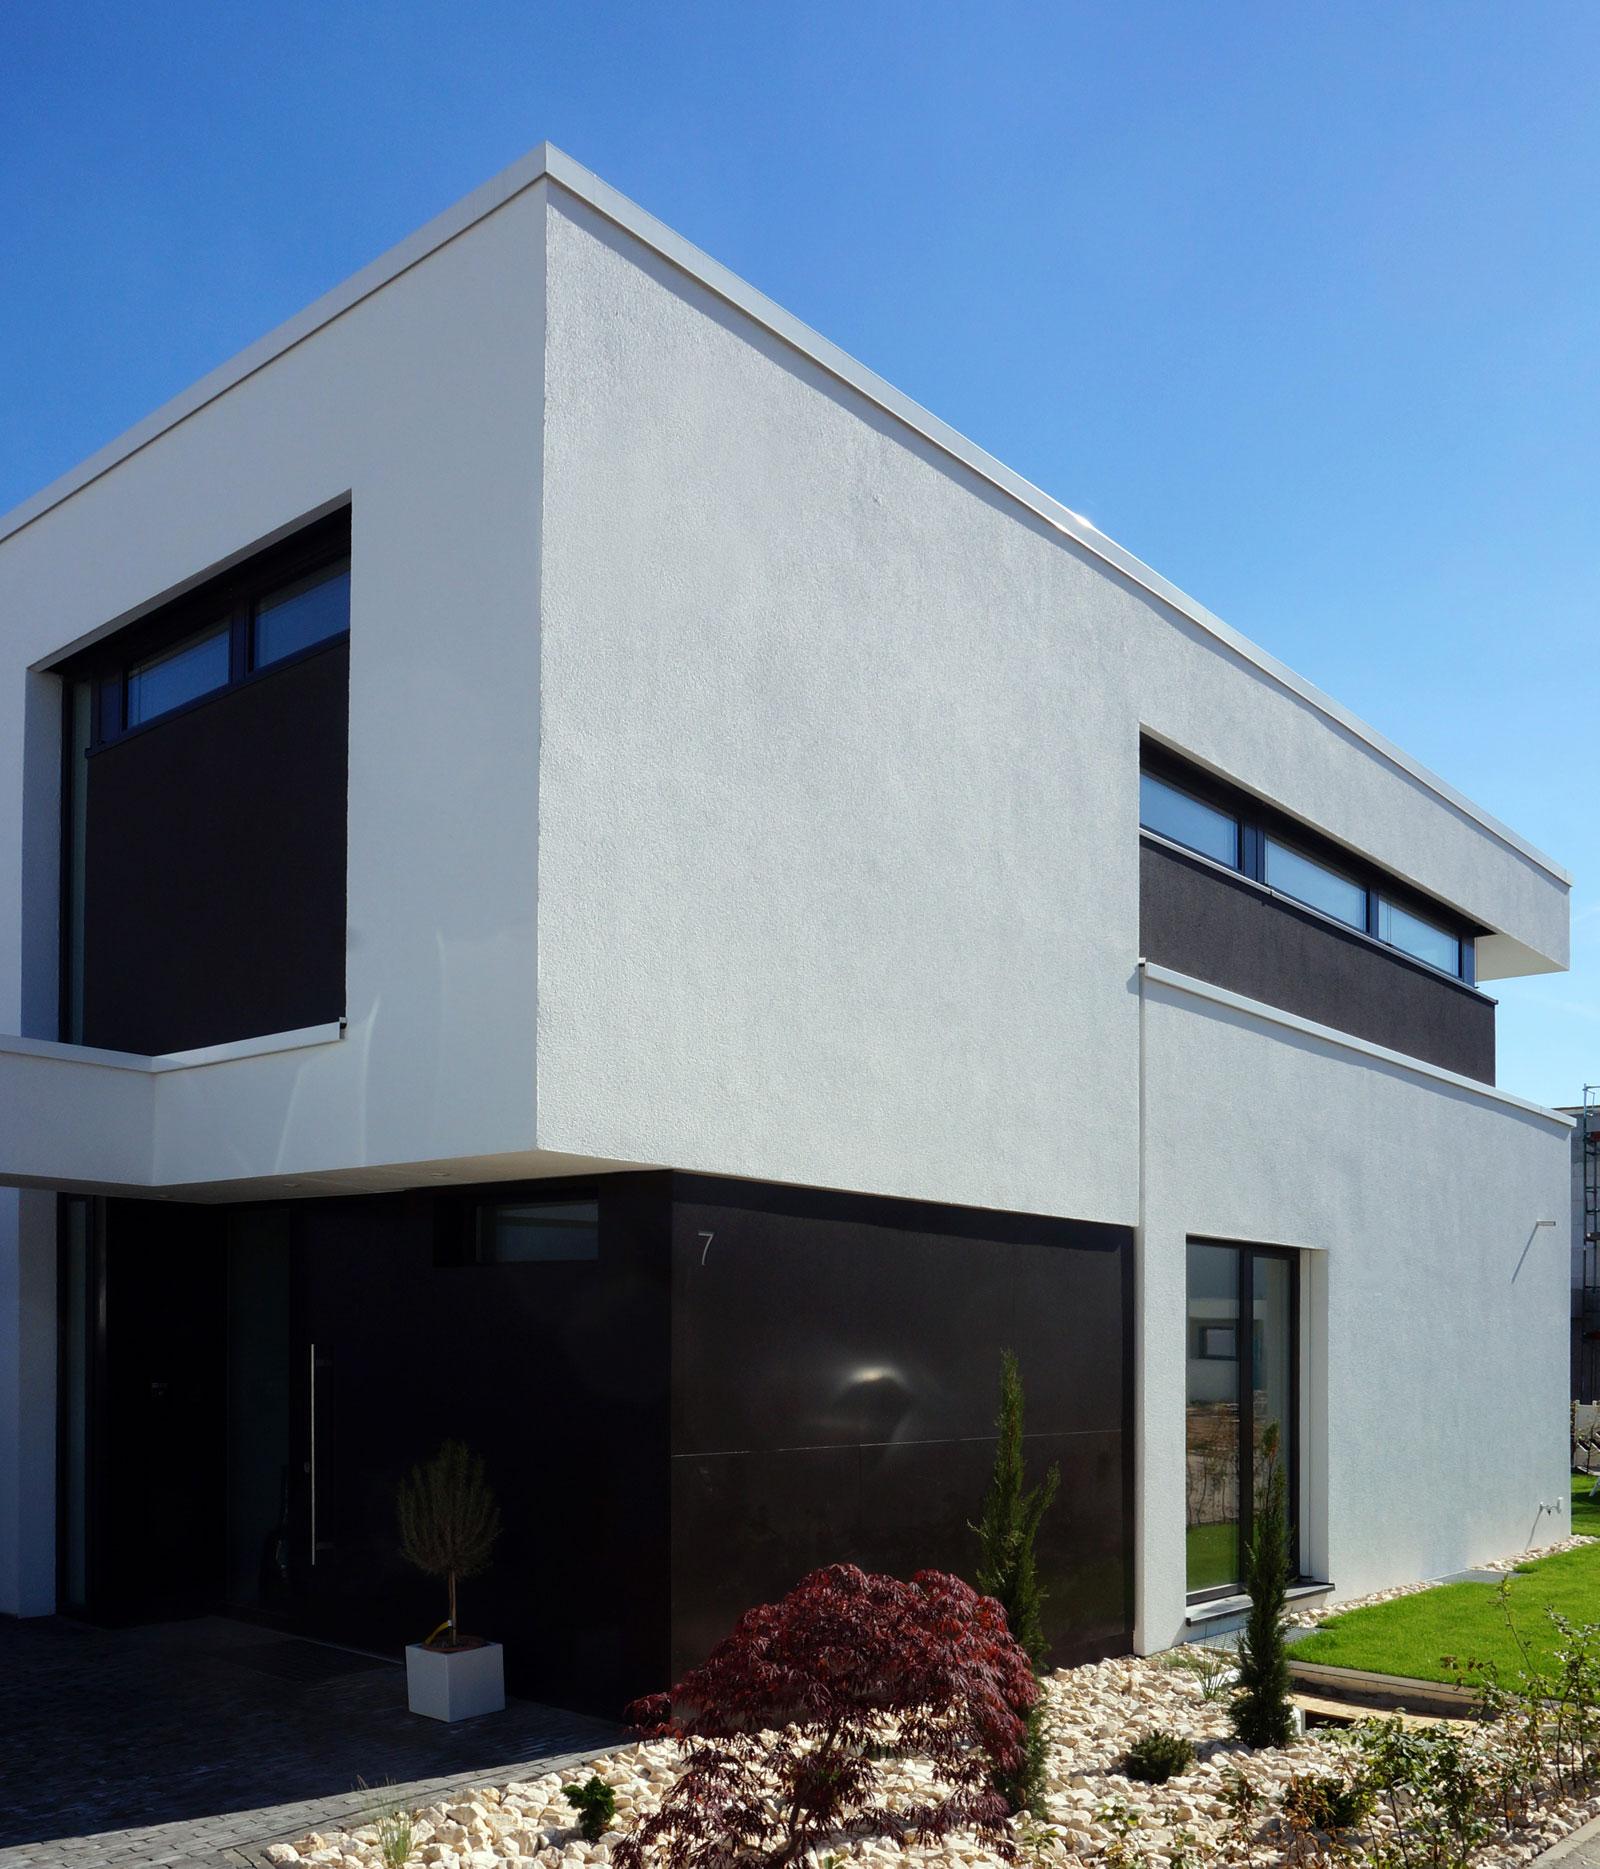 ffm architekten. Black Bedroom Furniture Sets. Home Design Ideas